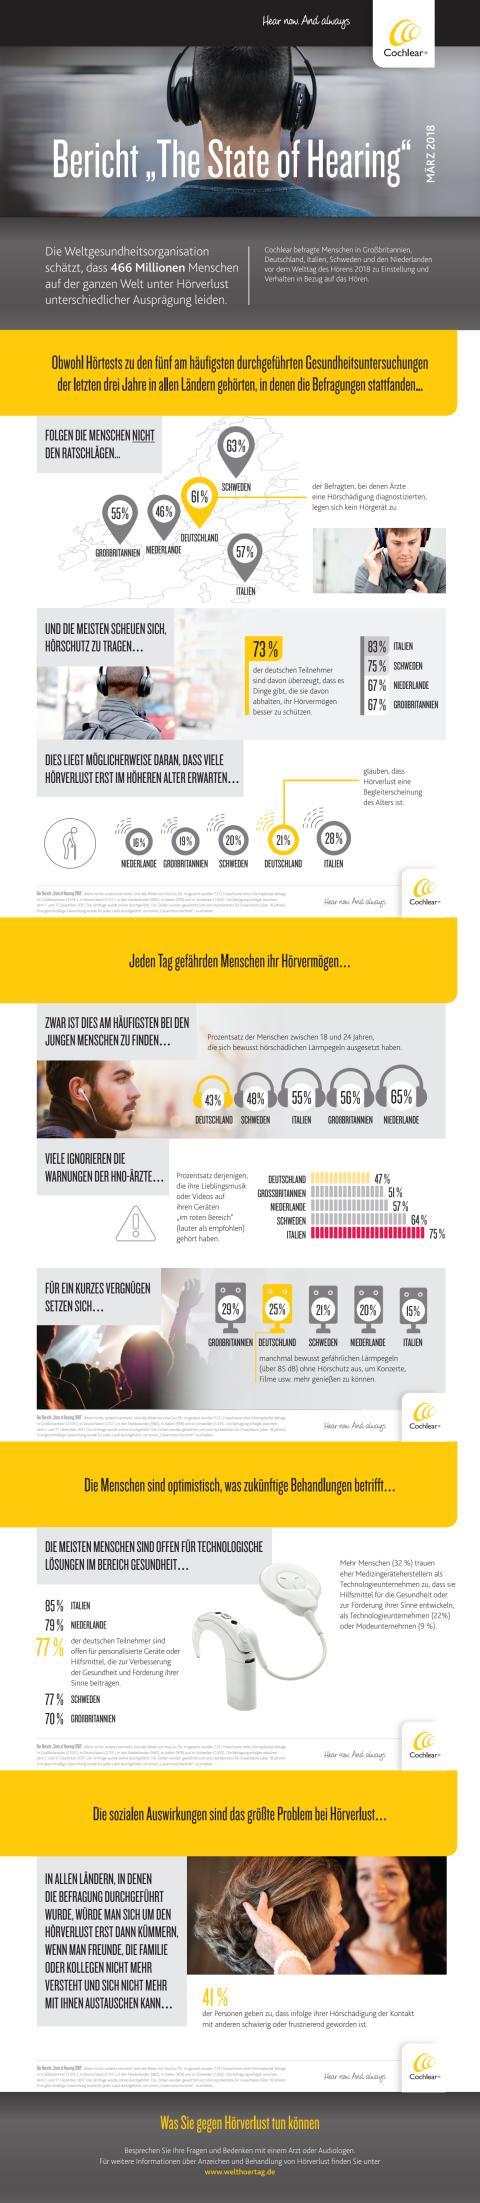 "Infografik zum Bericht ""The State of Hearing"""